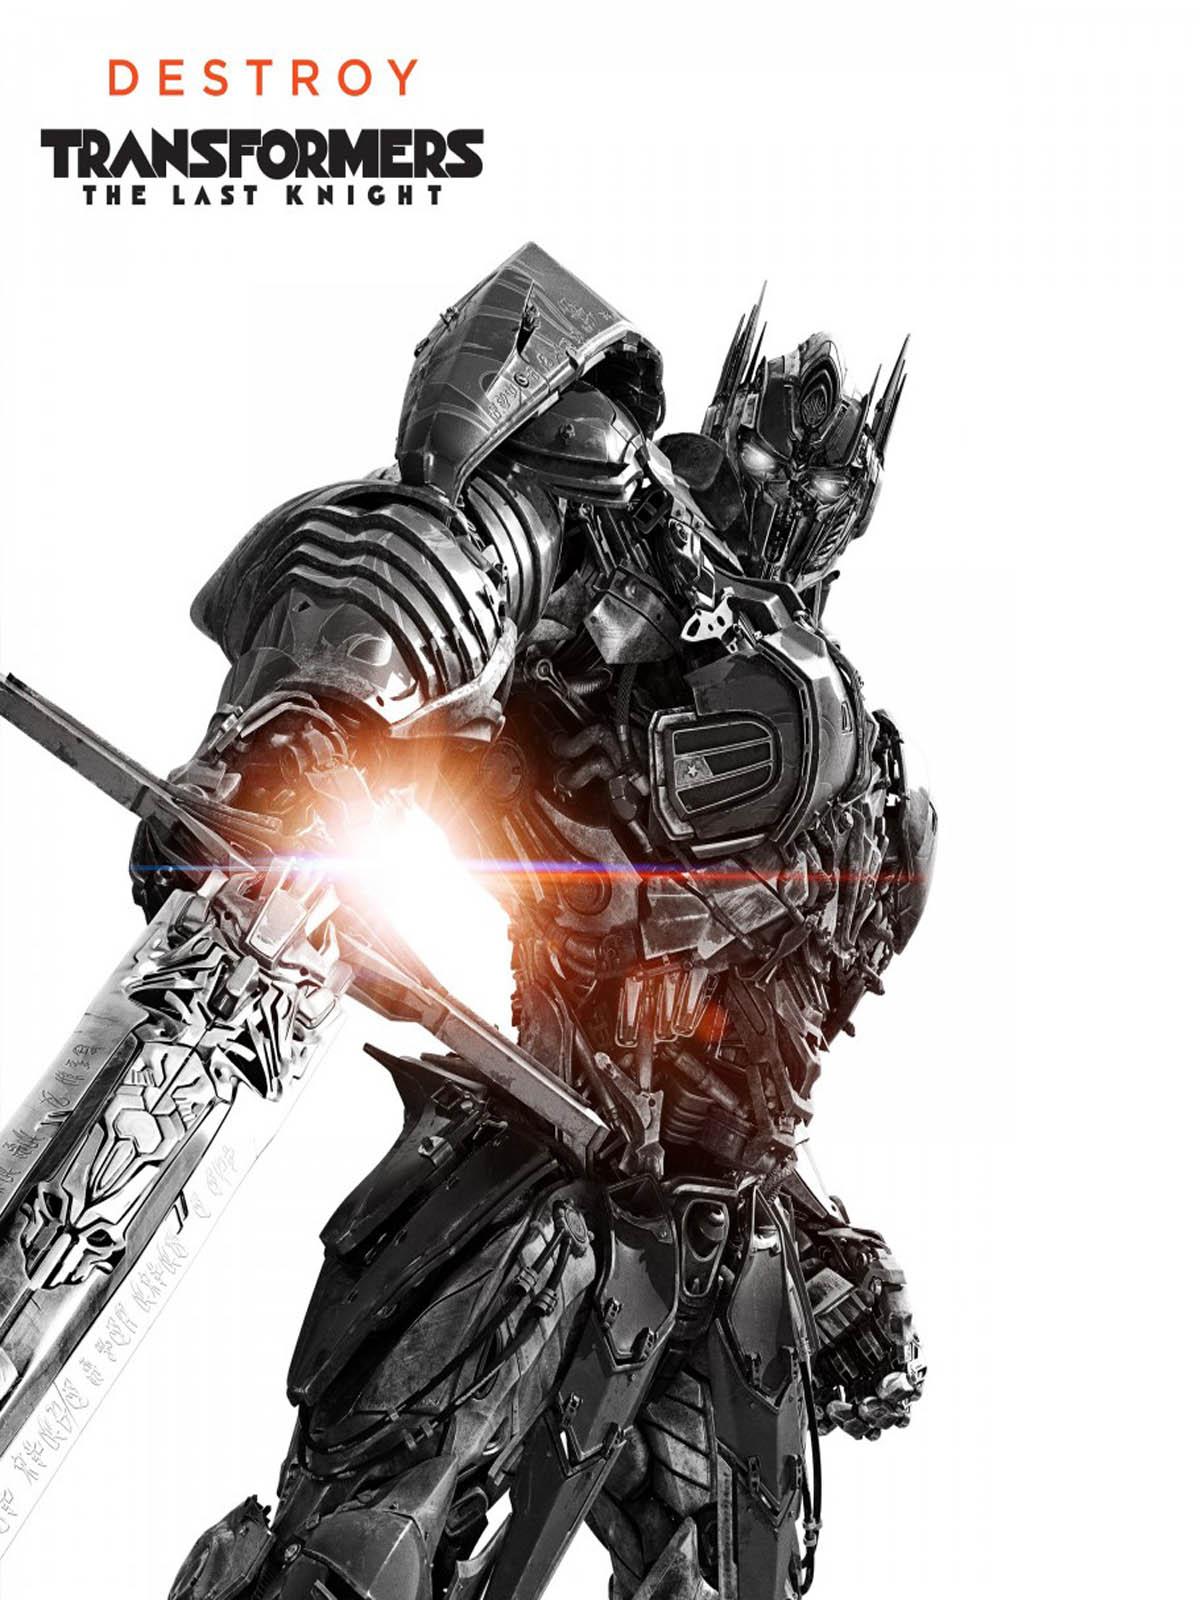 Optimus Prime Transformers The Last Knight Free 4k Ultra Hd Mobile